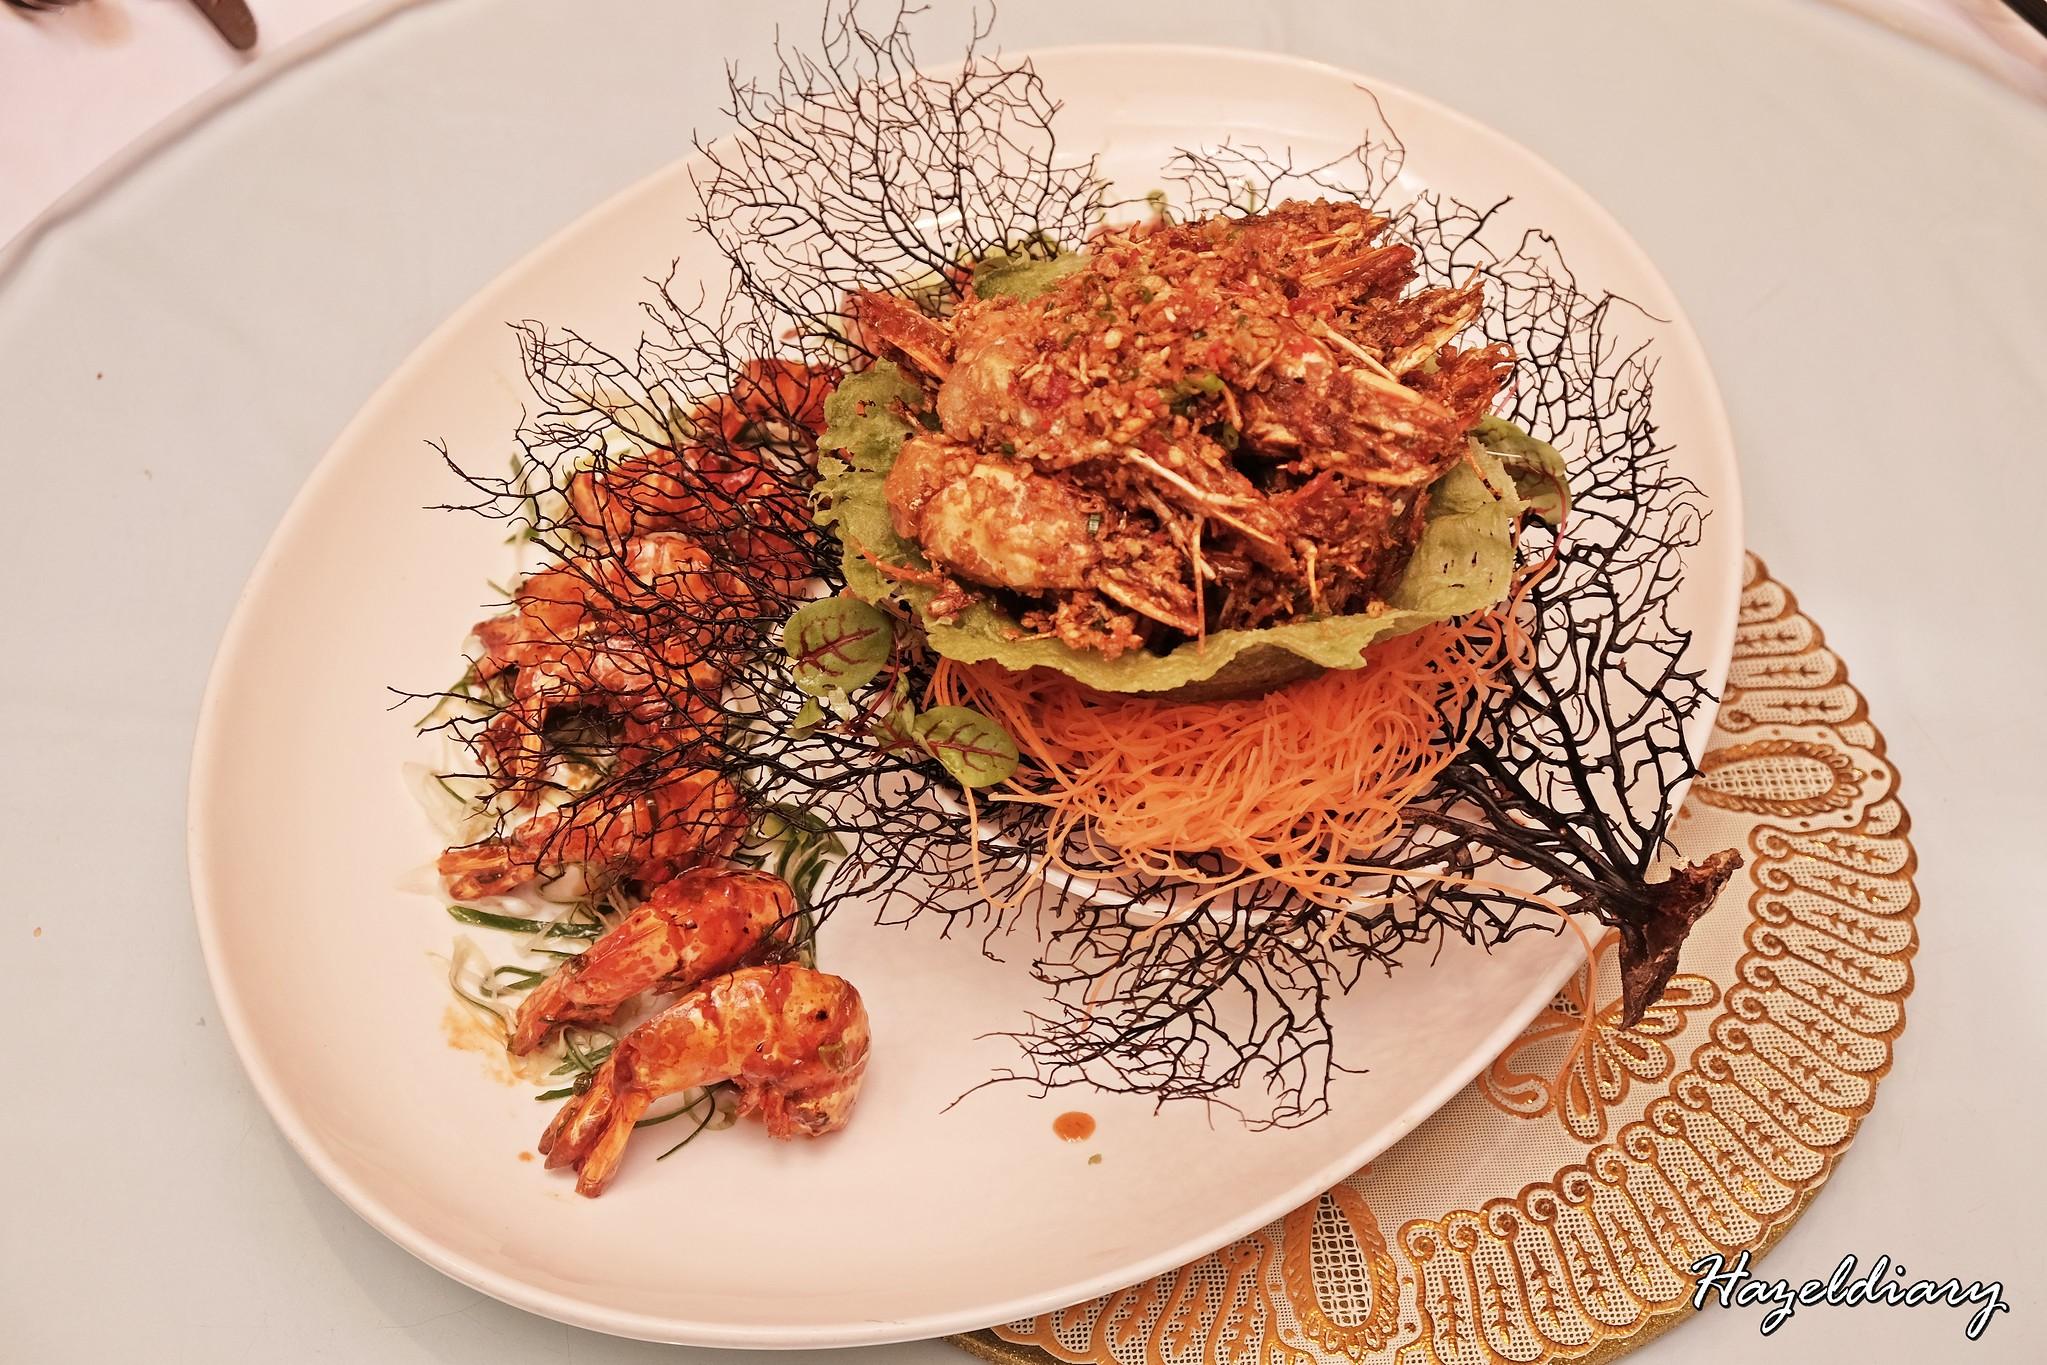 Crystal Jade Restaurant-CNY 2019-Prawns